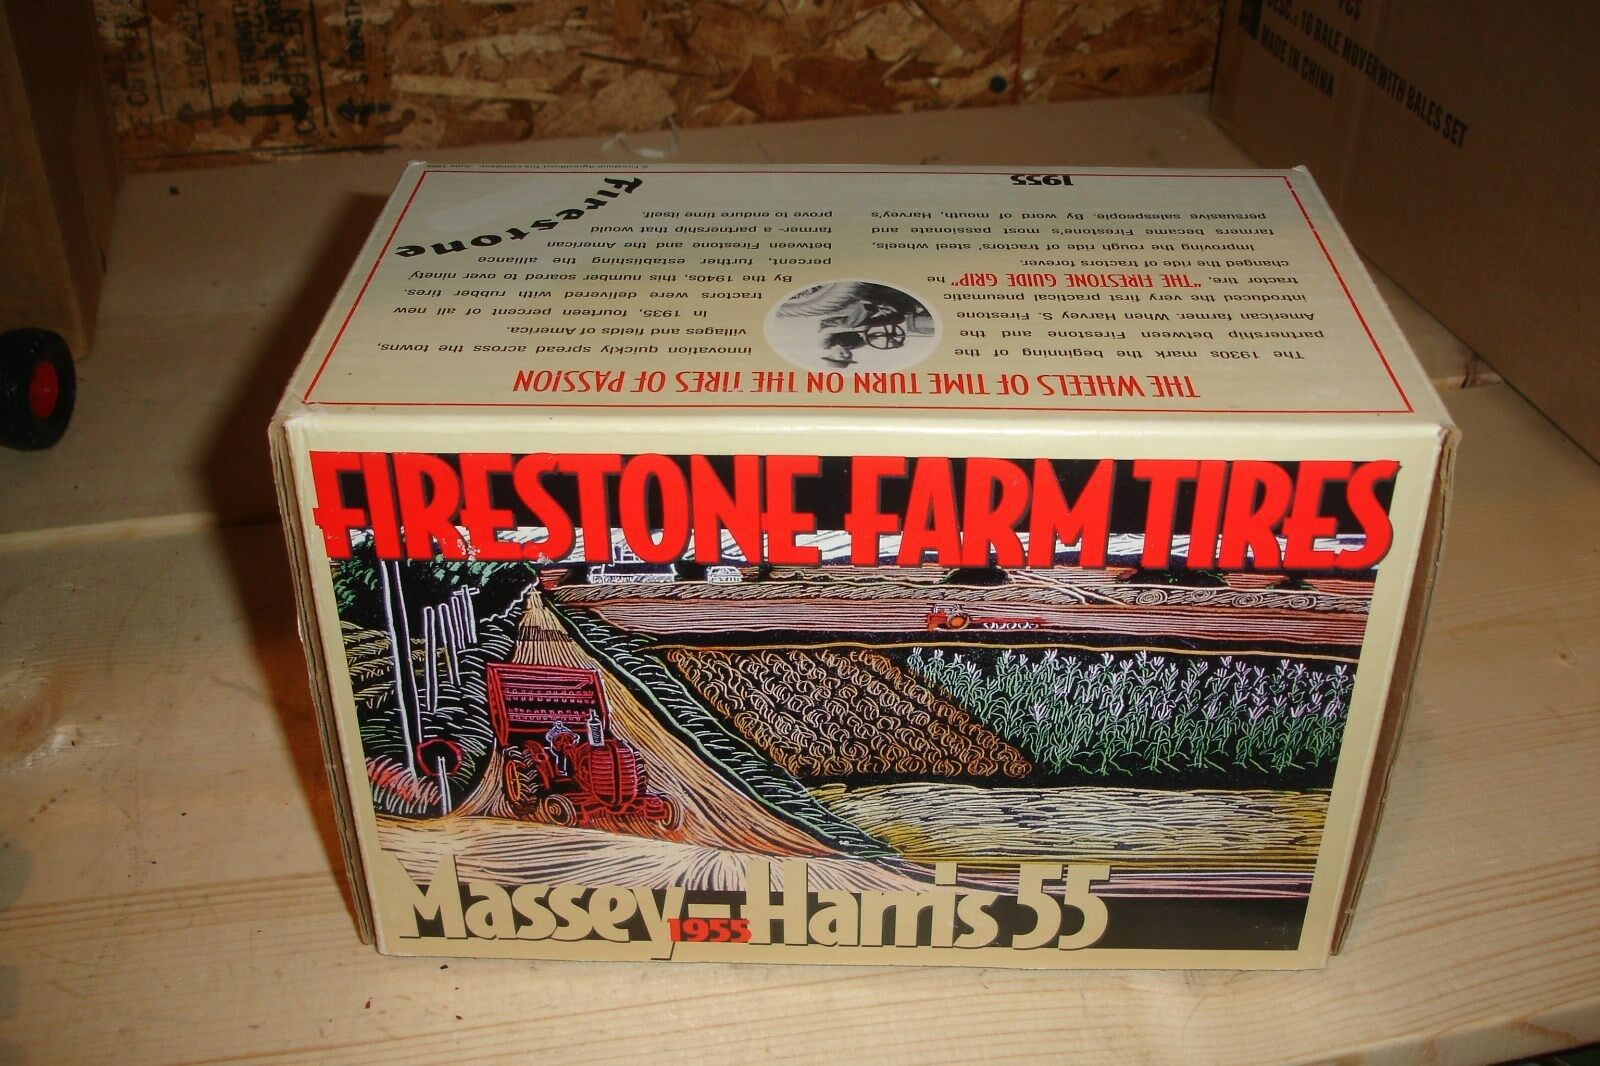 1 16 Massey Harris 55 Toy Tractor - Firestone Tires